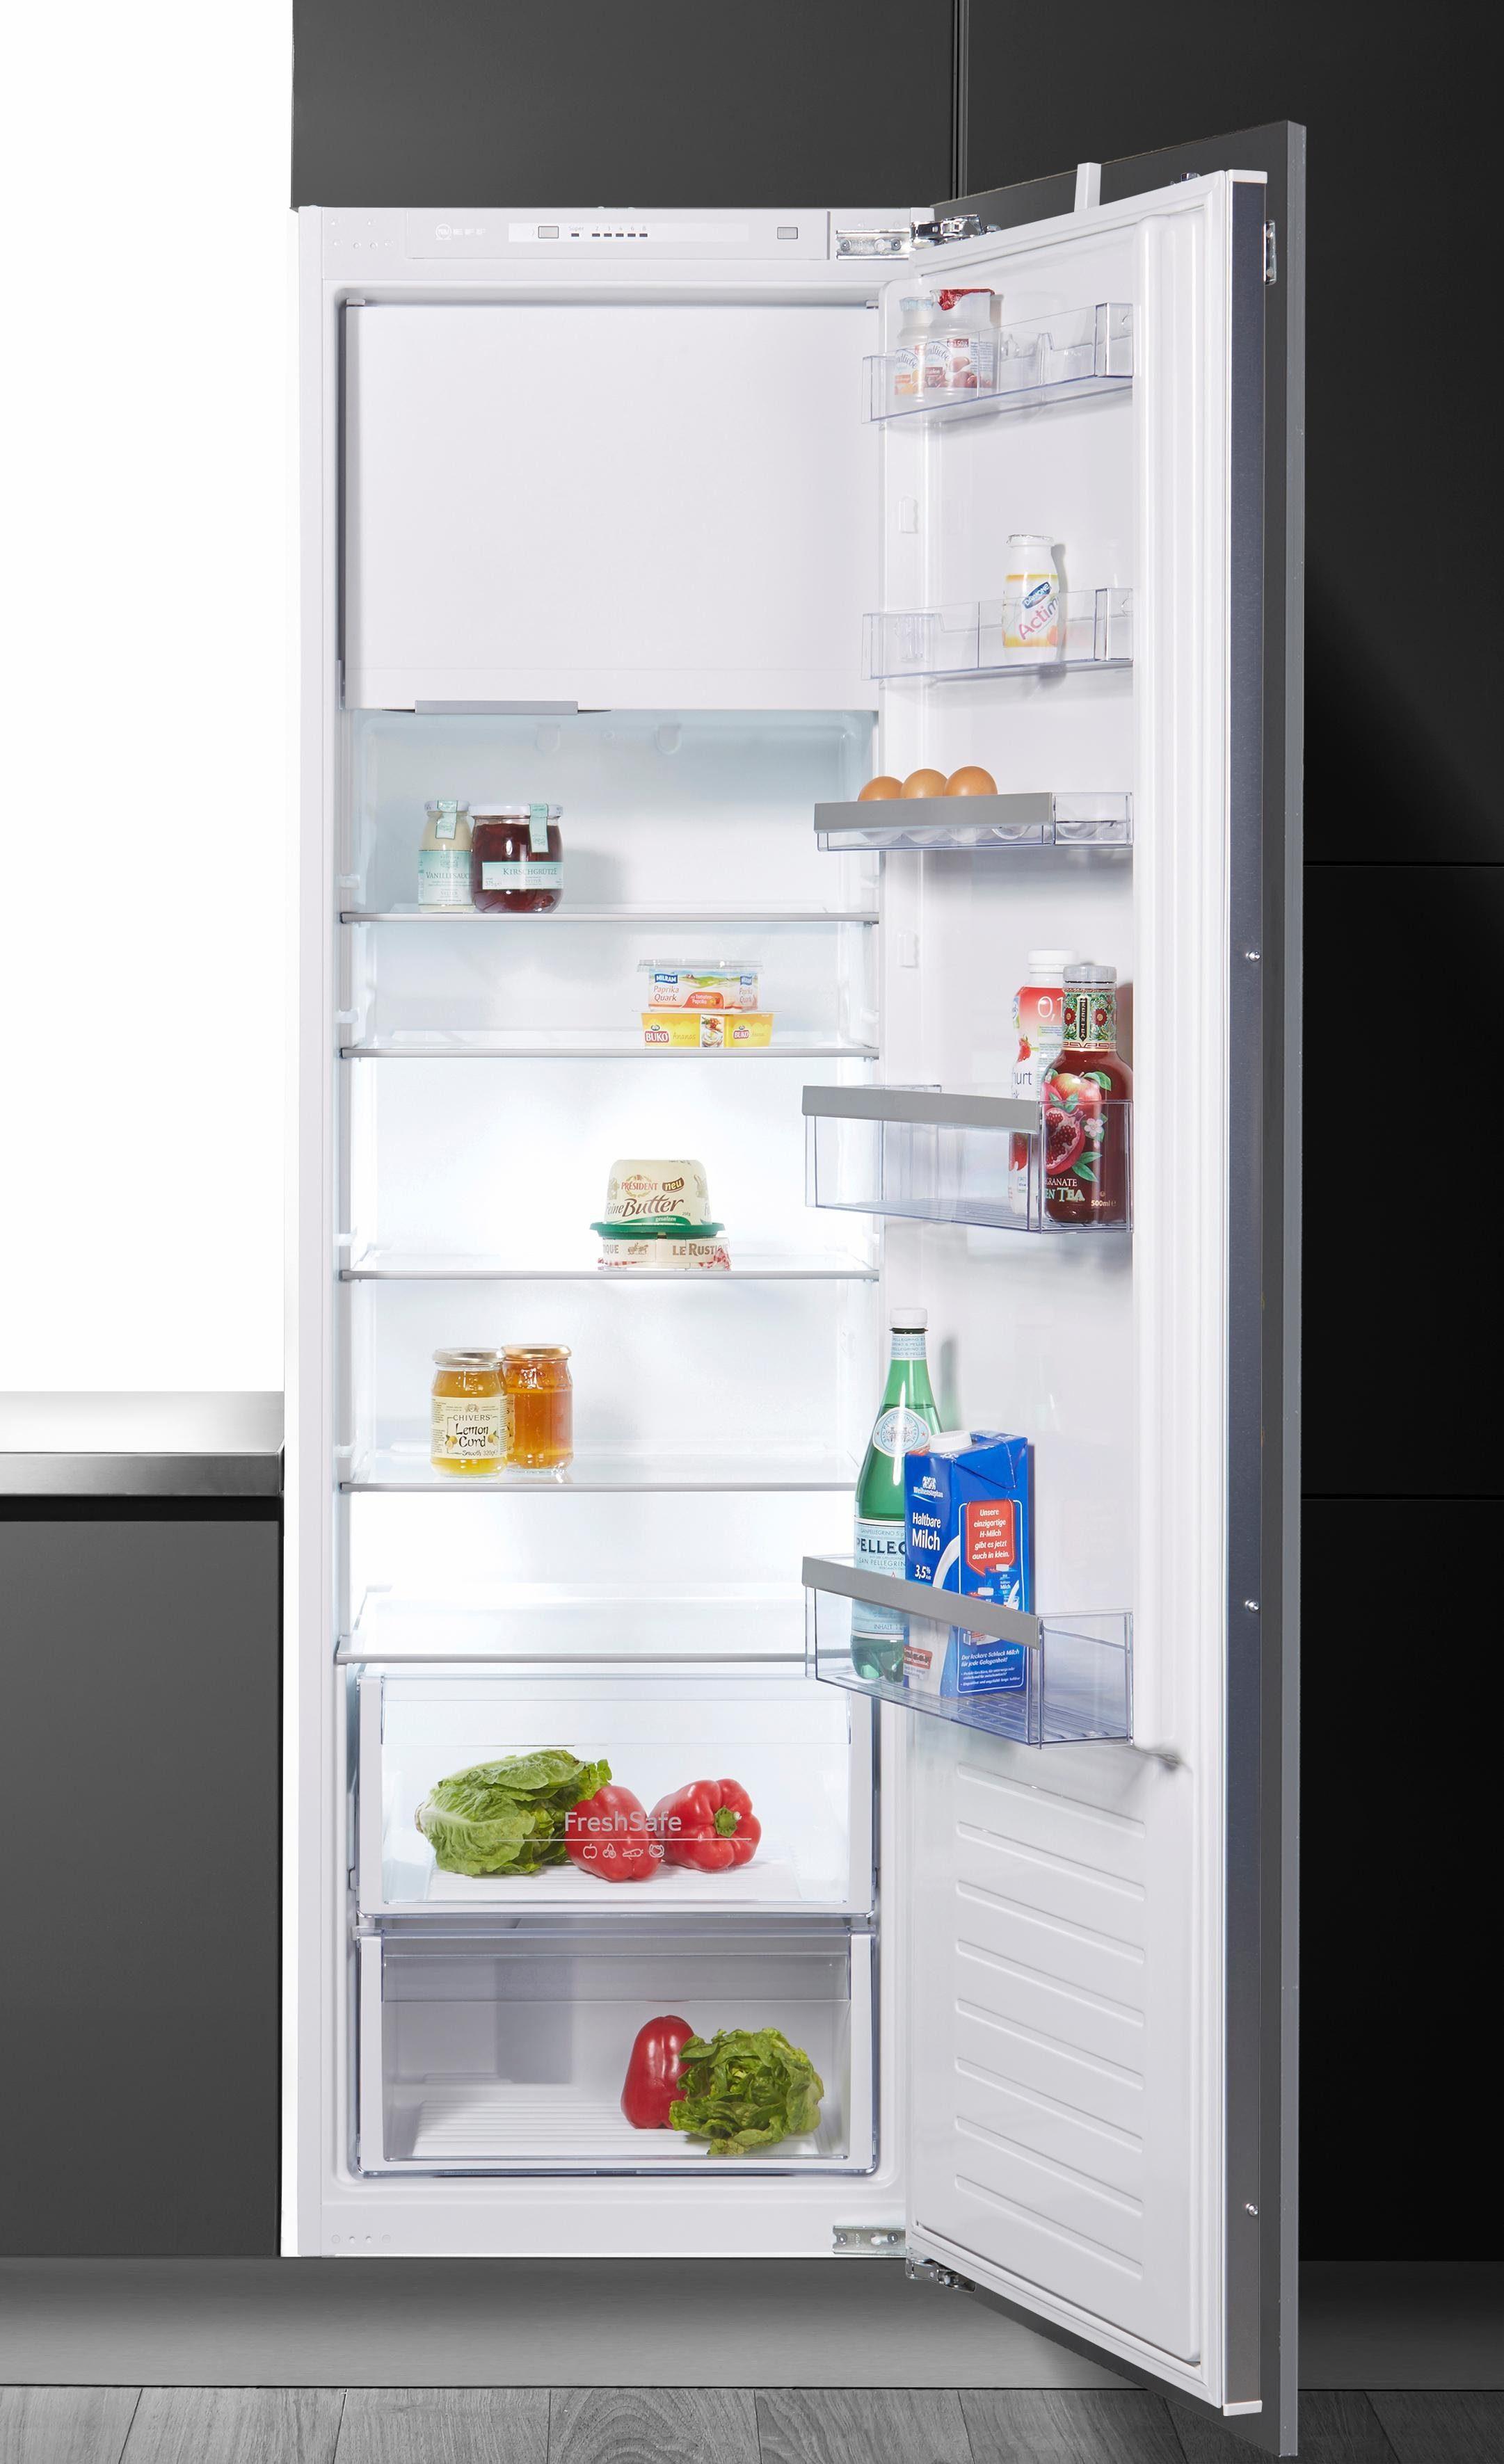 NEFF Einbaukühlschrank K825A2 / KI2822F30, 177,2 cm hoch, 54,1 cm breit, integrierbar